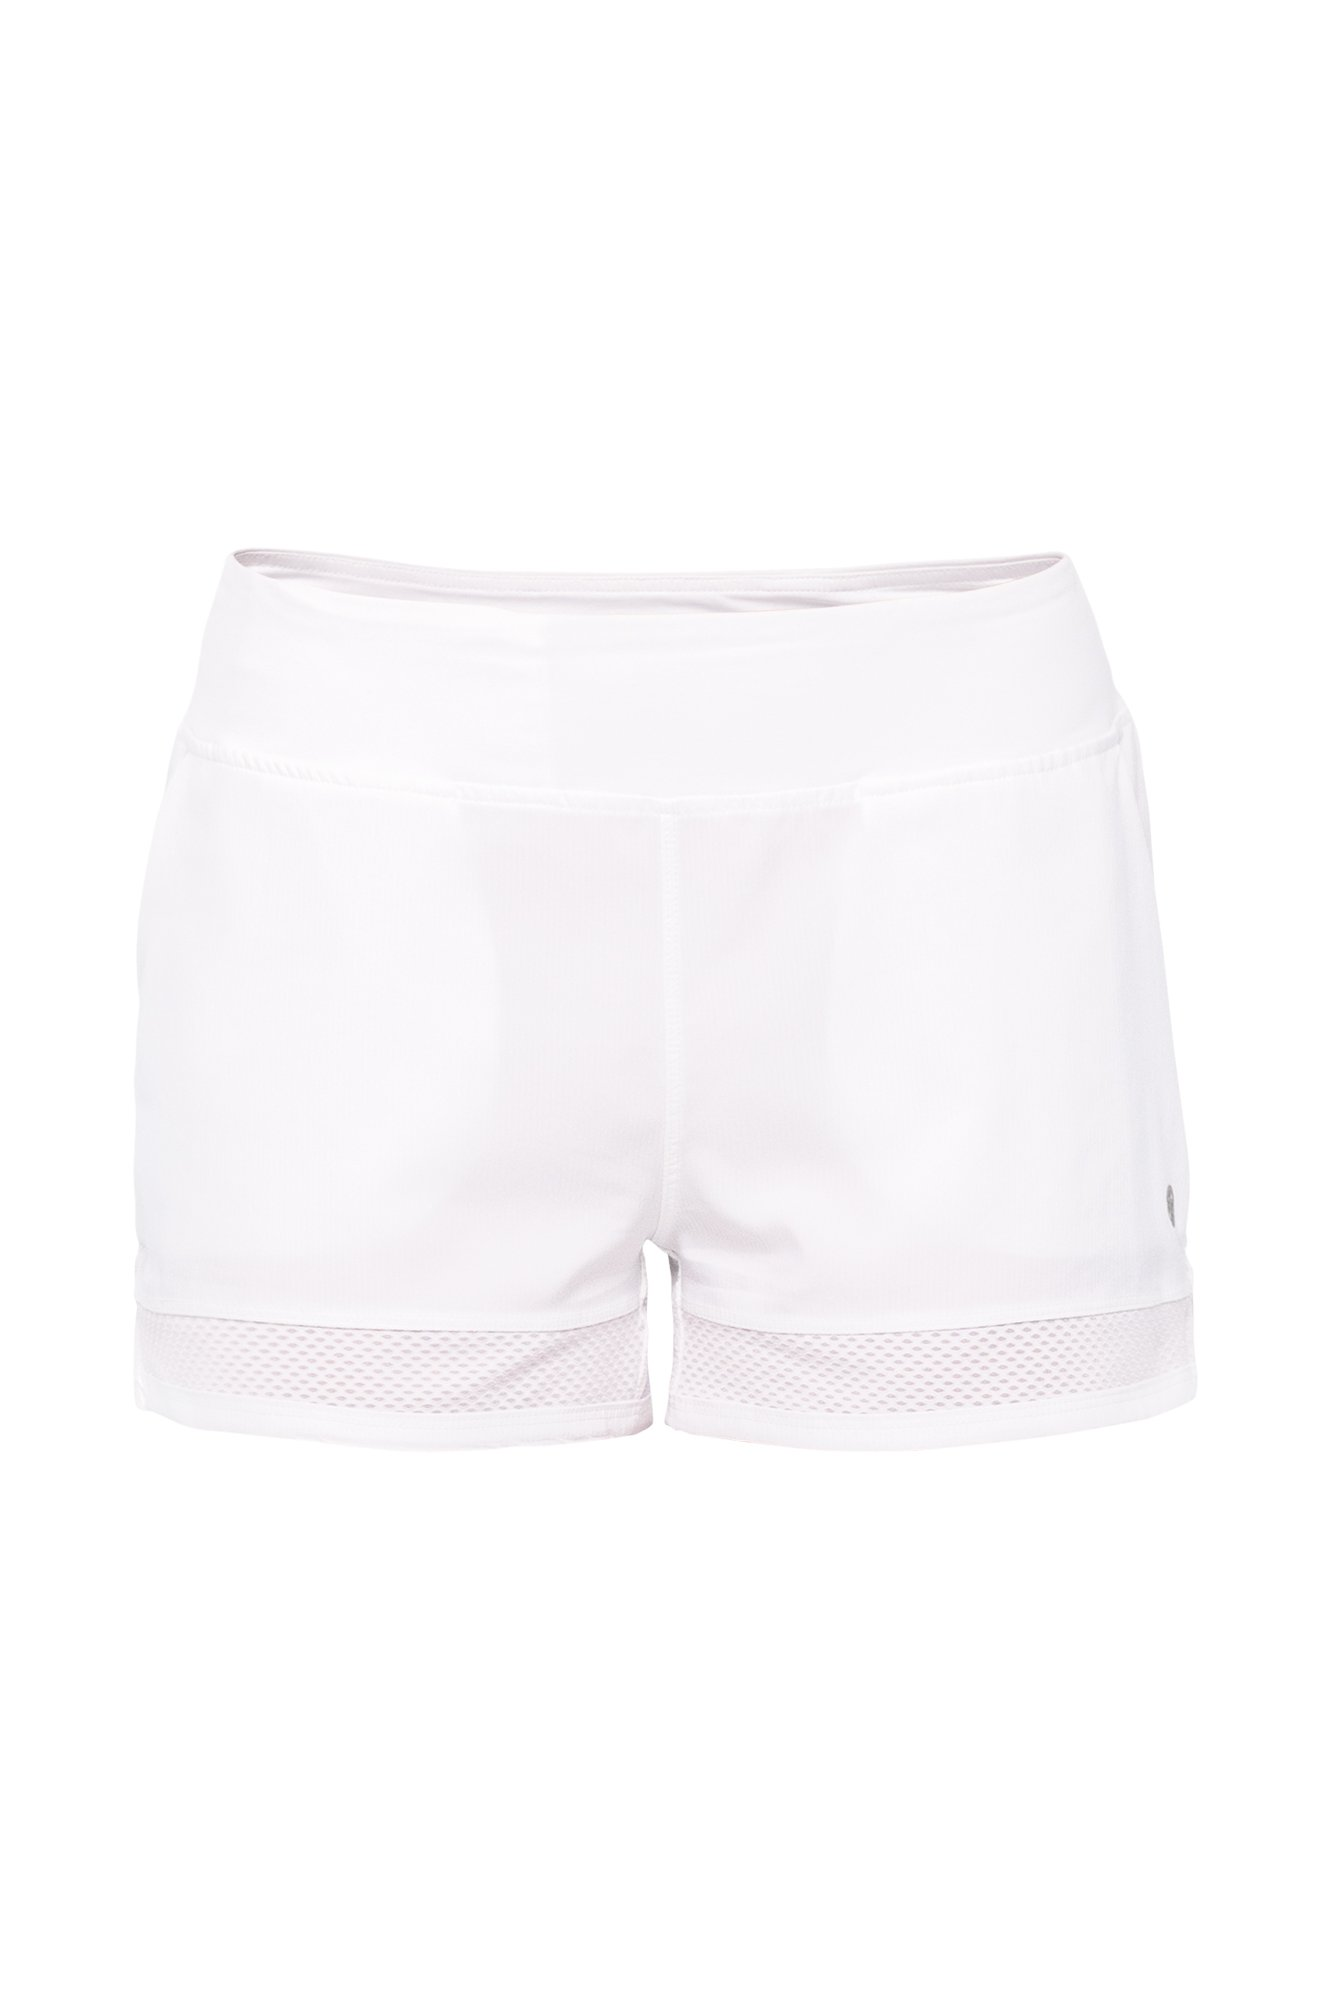 Lija Women's Shadow Mesh Cut Out Shorts, White, X-Large